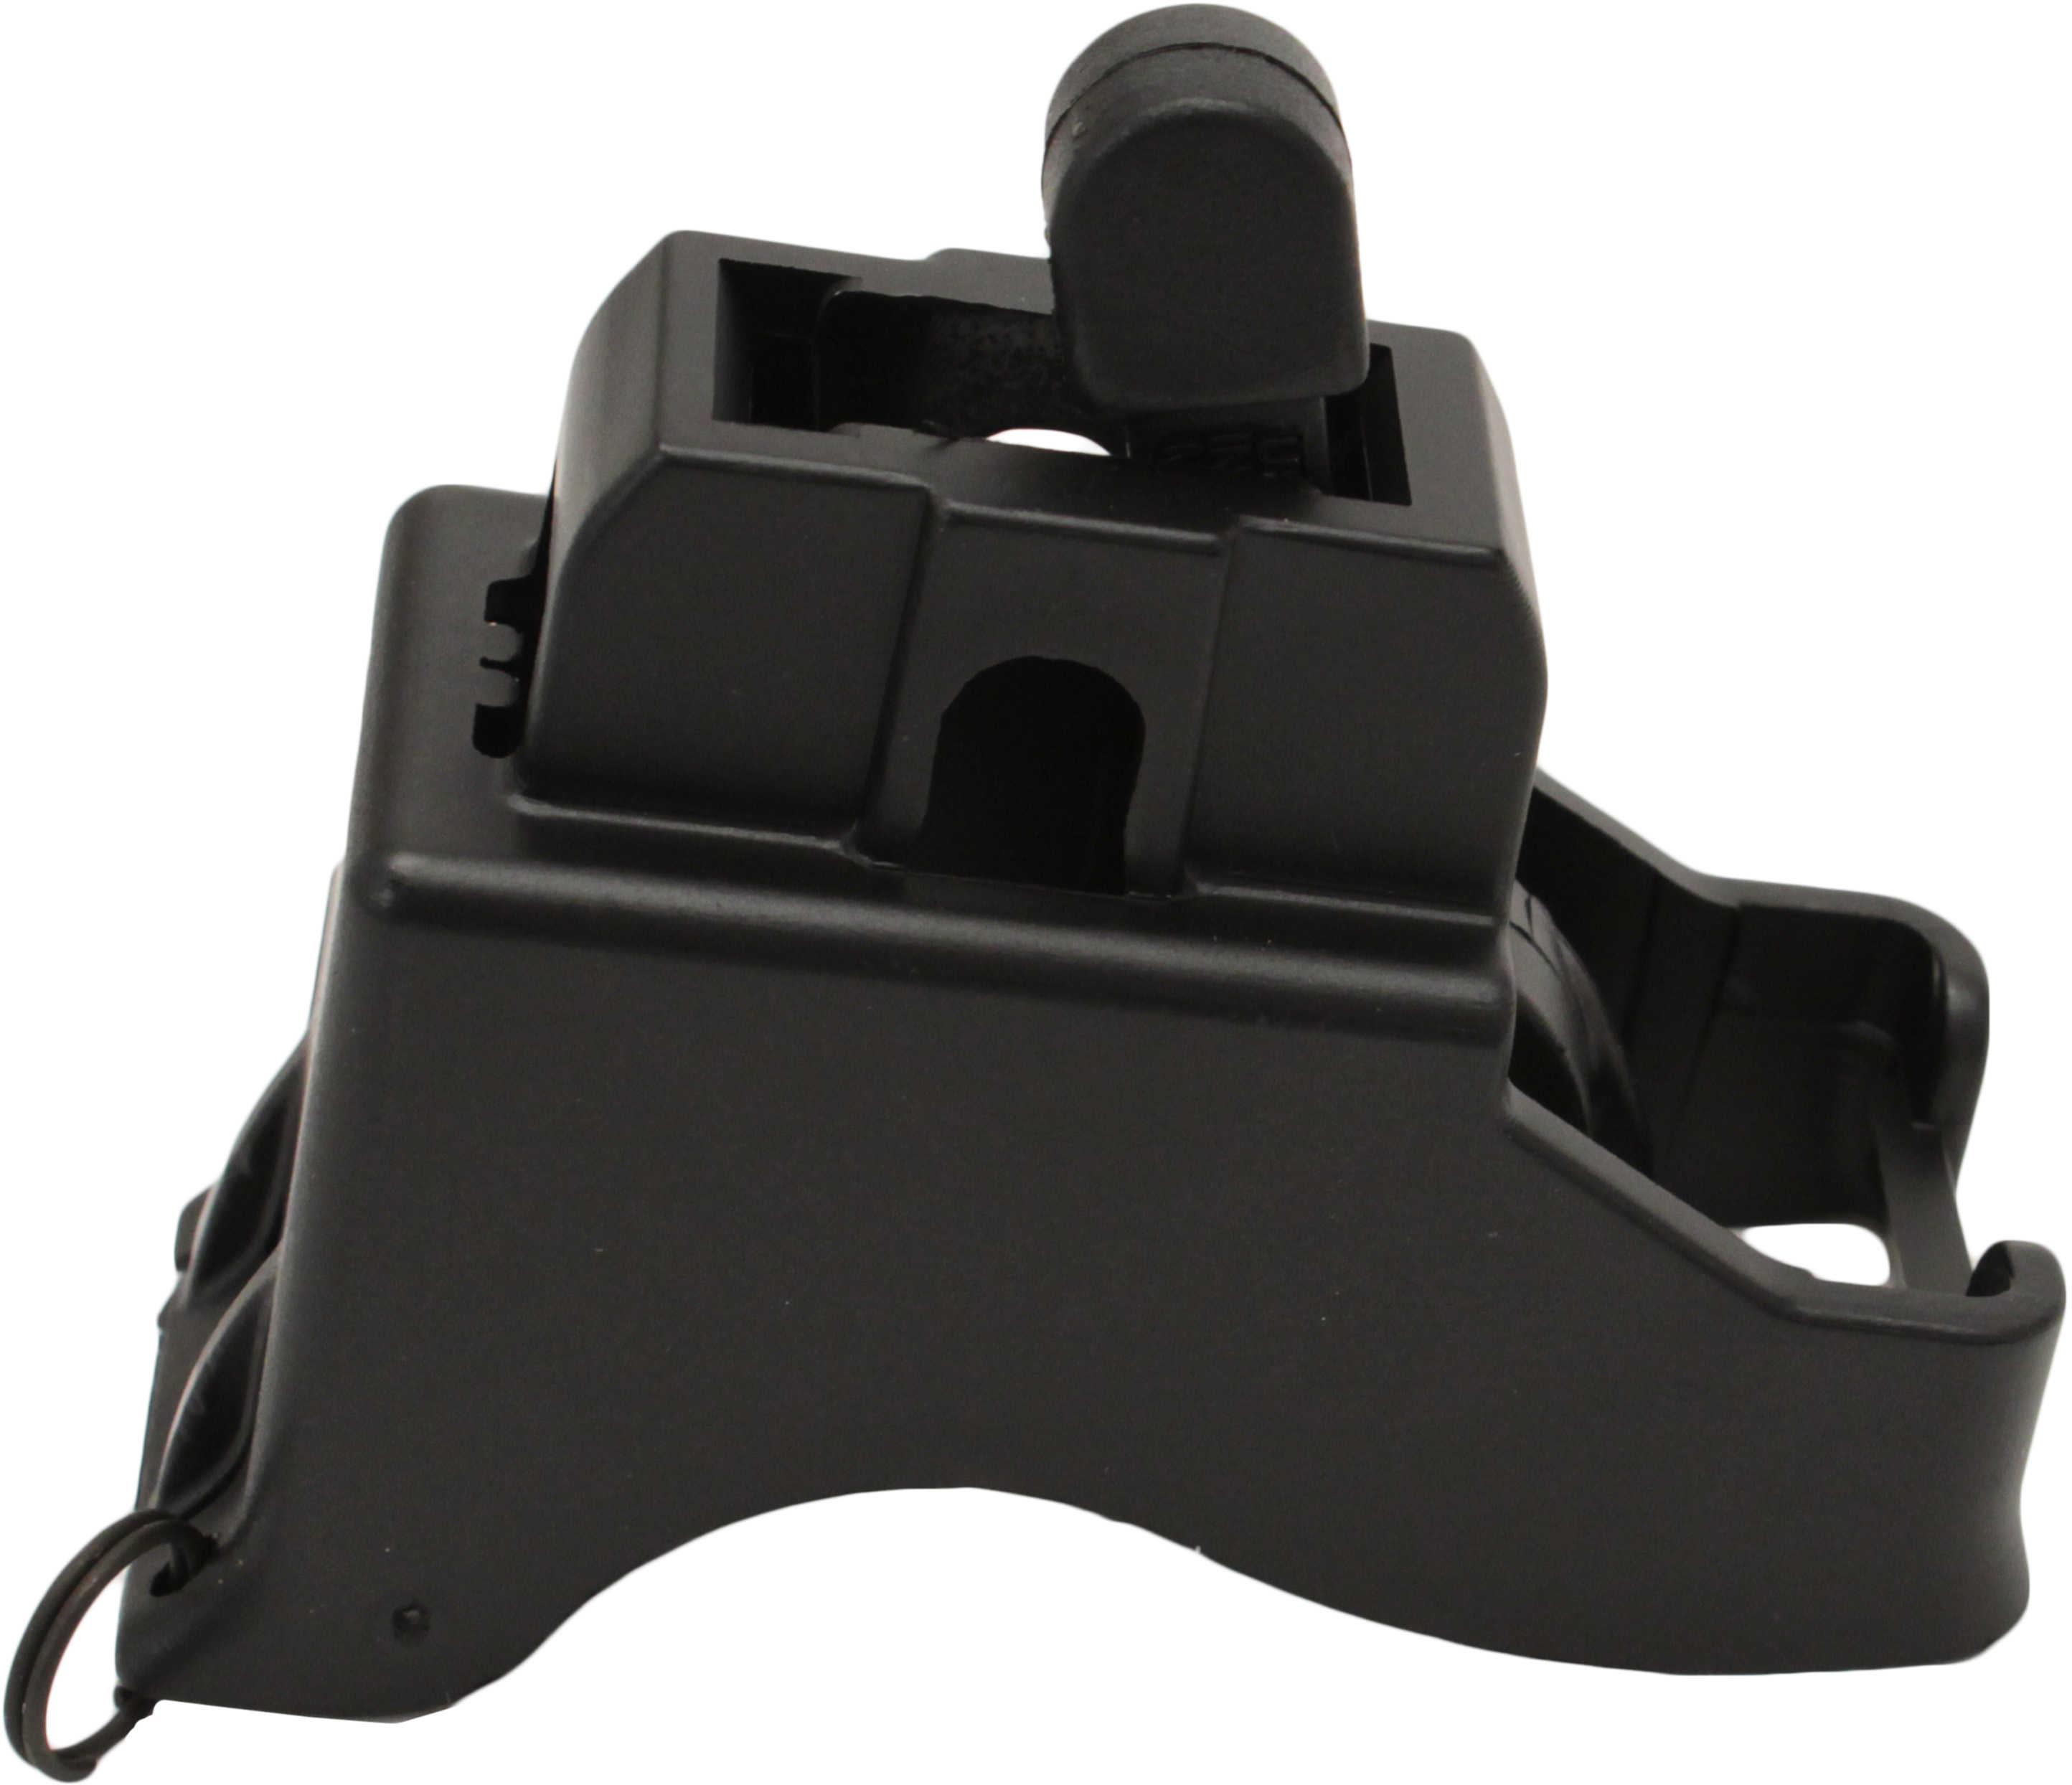 MagLula Ltd Mag Loader/UnLoader Lula AK47/Galil 7.62 NATO N/A Black AK-47 Lu12B